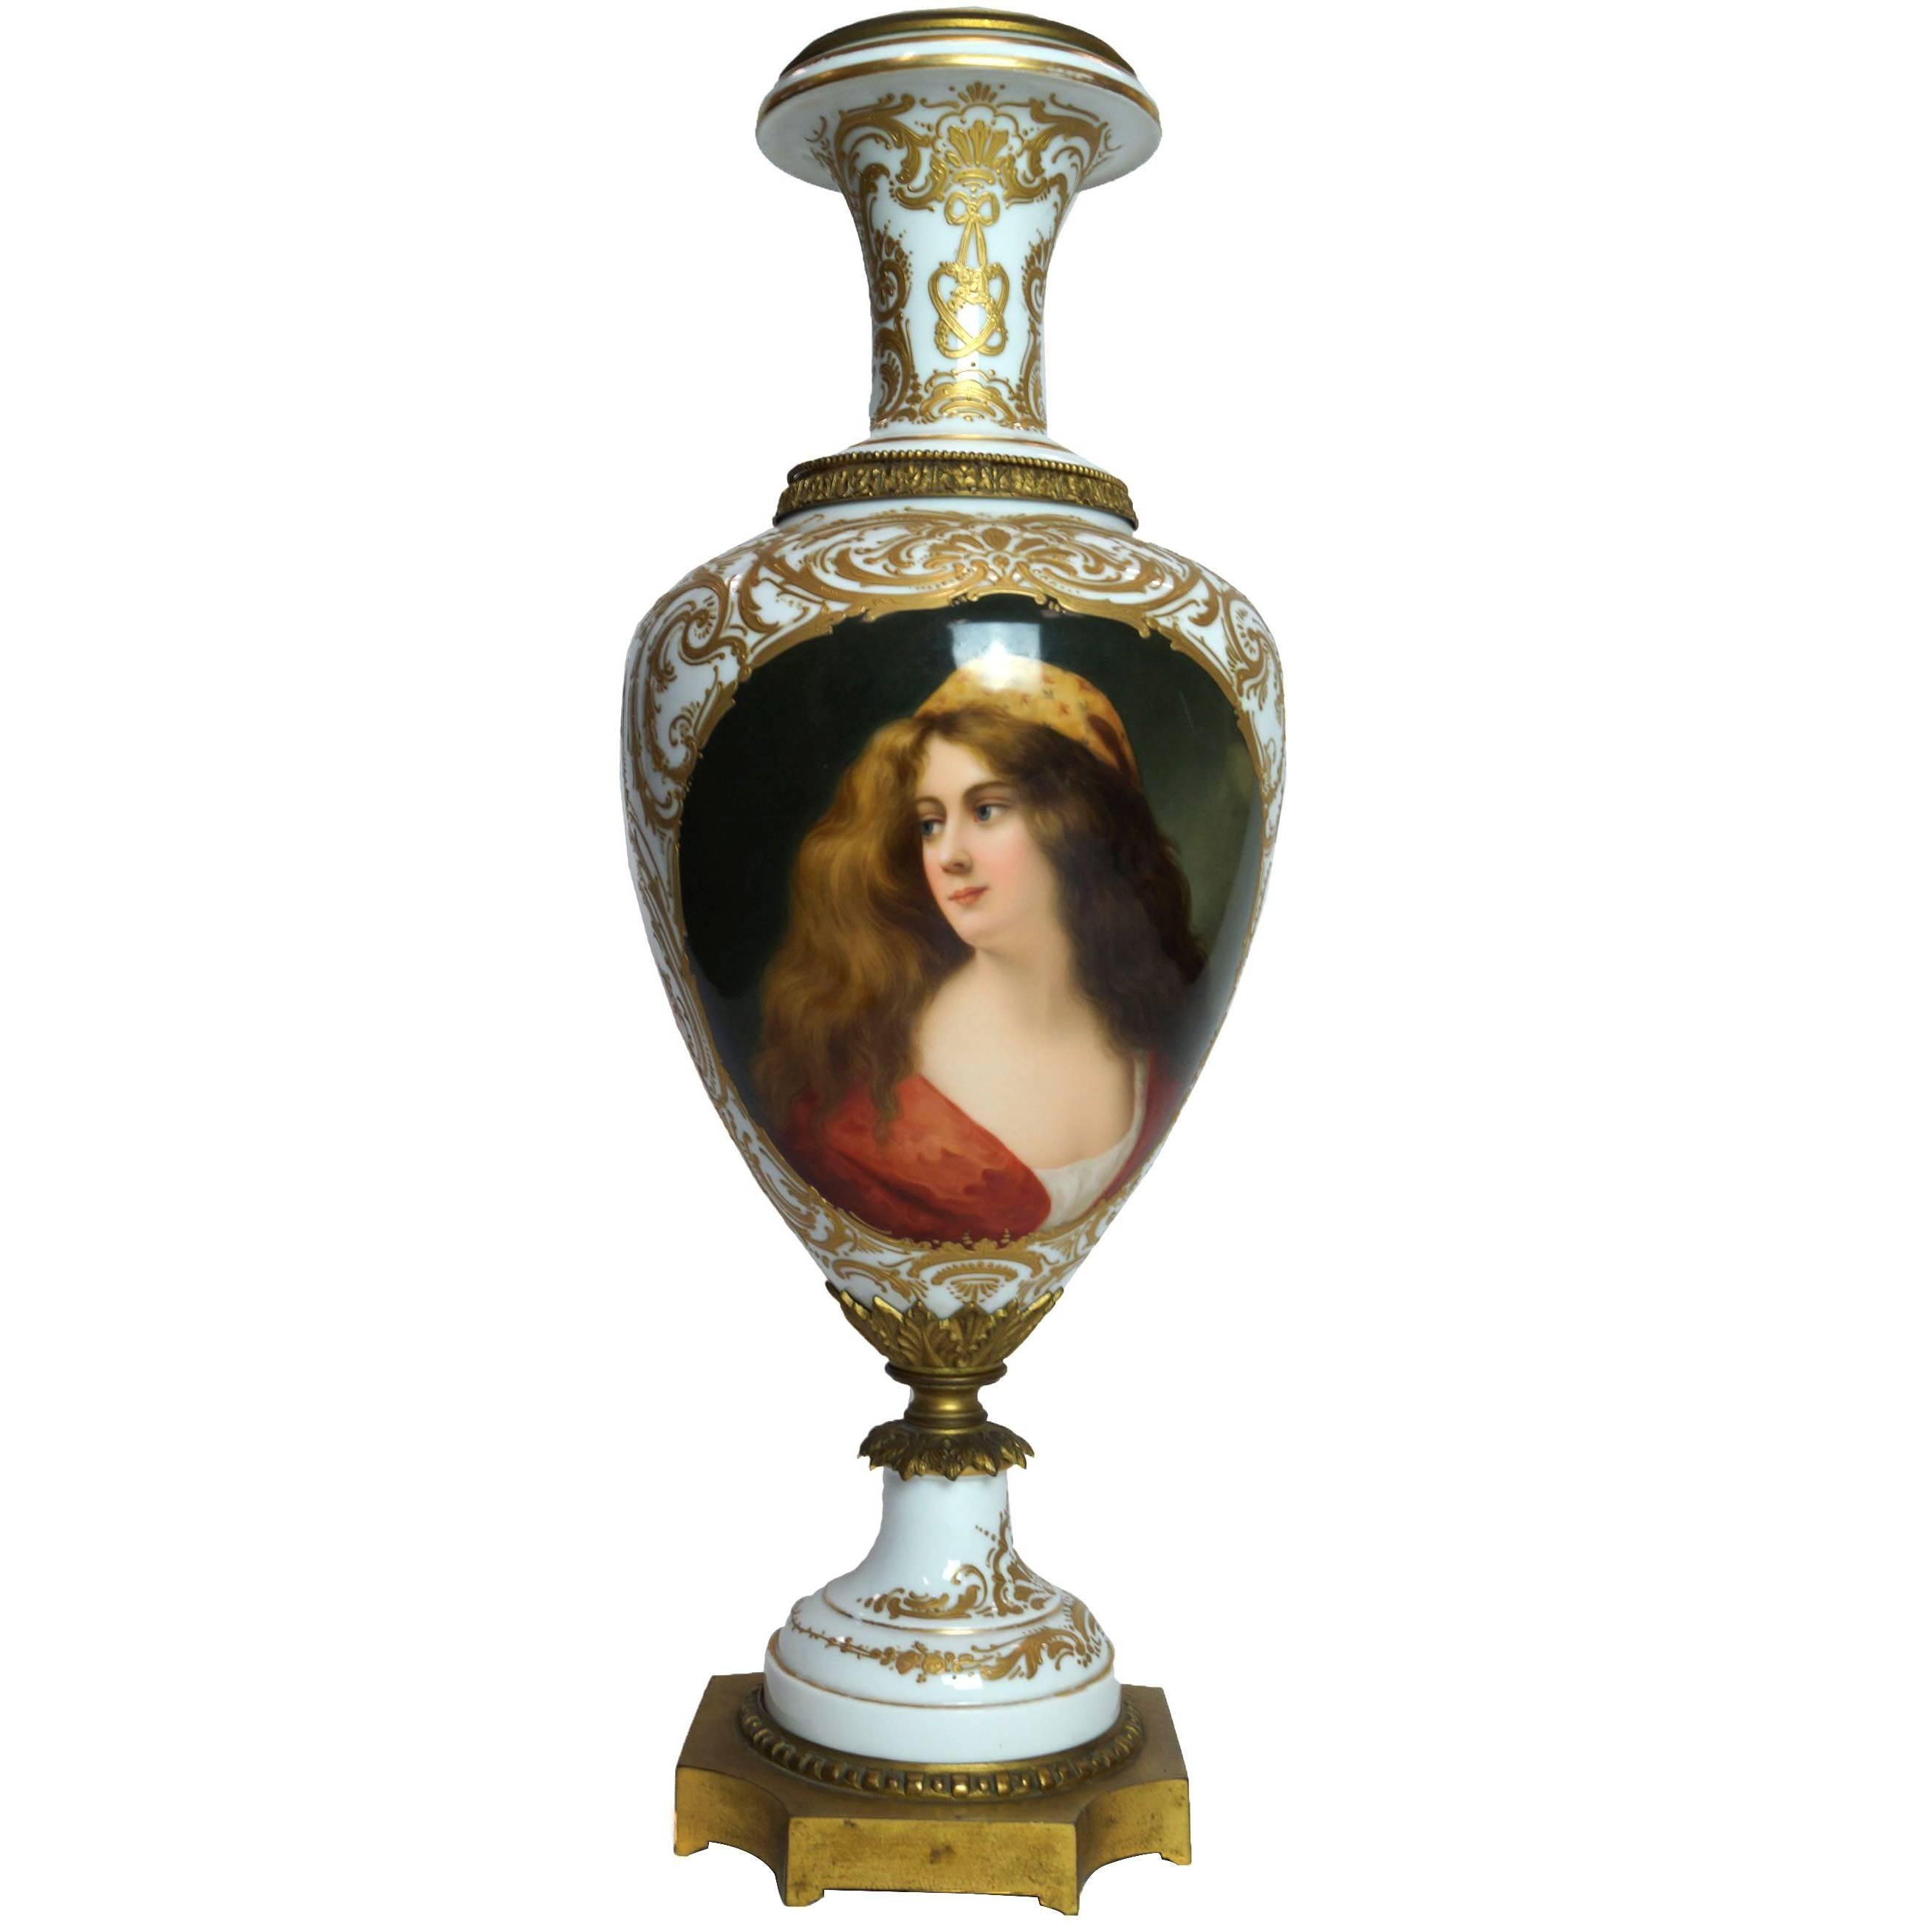 19th Century Austrian Bronze-Mounted Royal Vienna Hand-Painted Vase